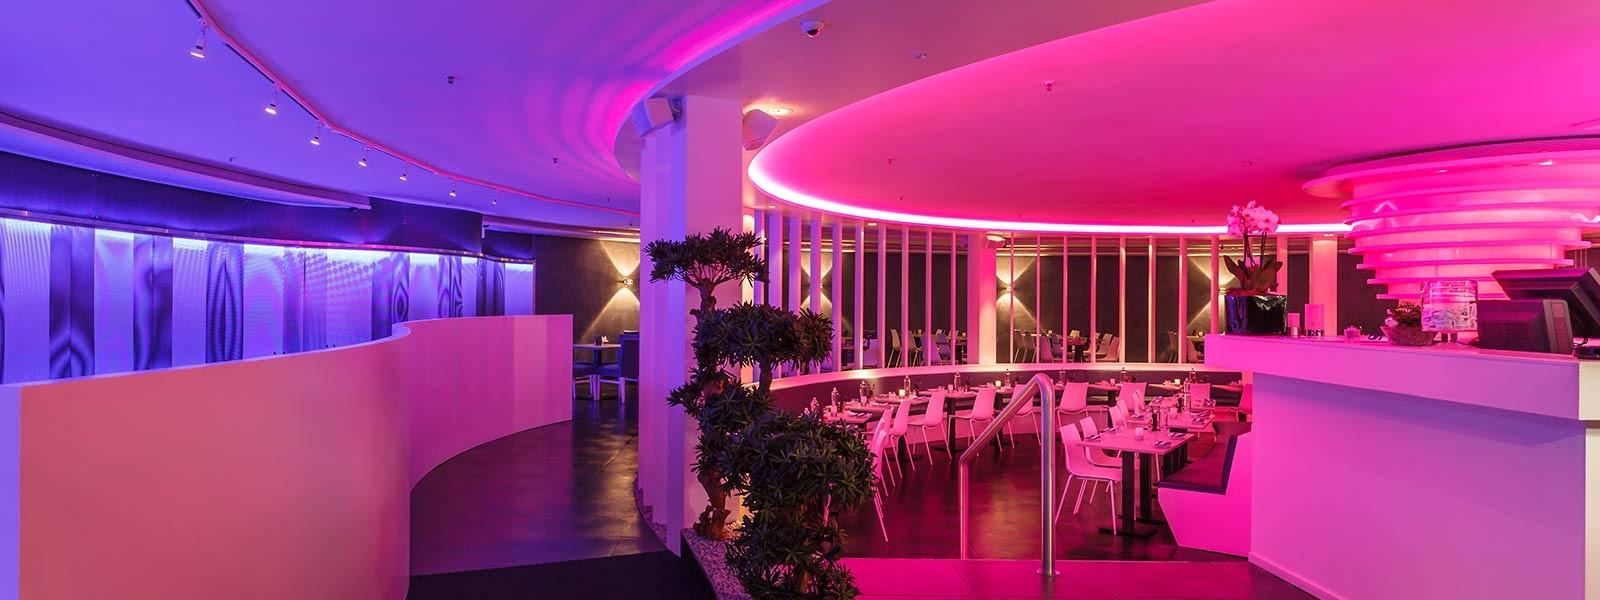 Shiki Sushi en Lounge, Rotterdam